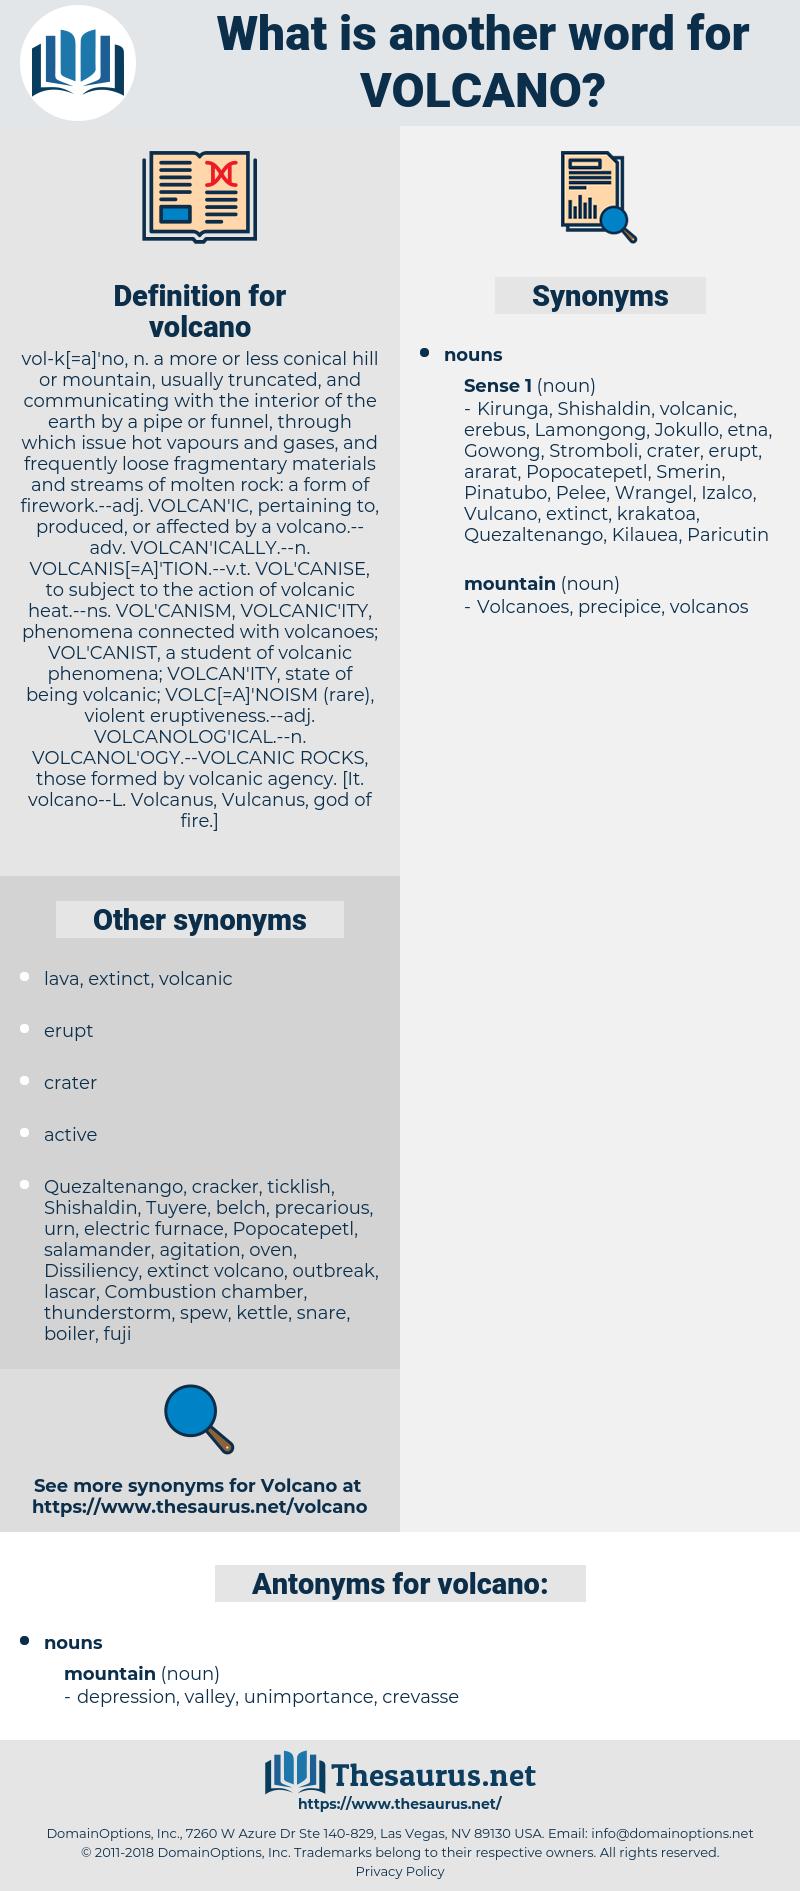 volcano, synonym volcano, another word for volcano, words like volcano, thesaurus volcano